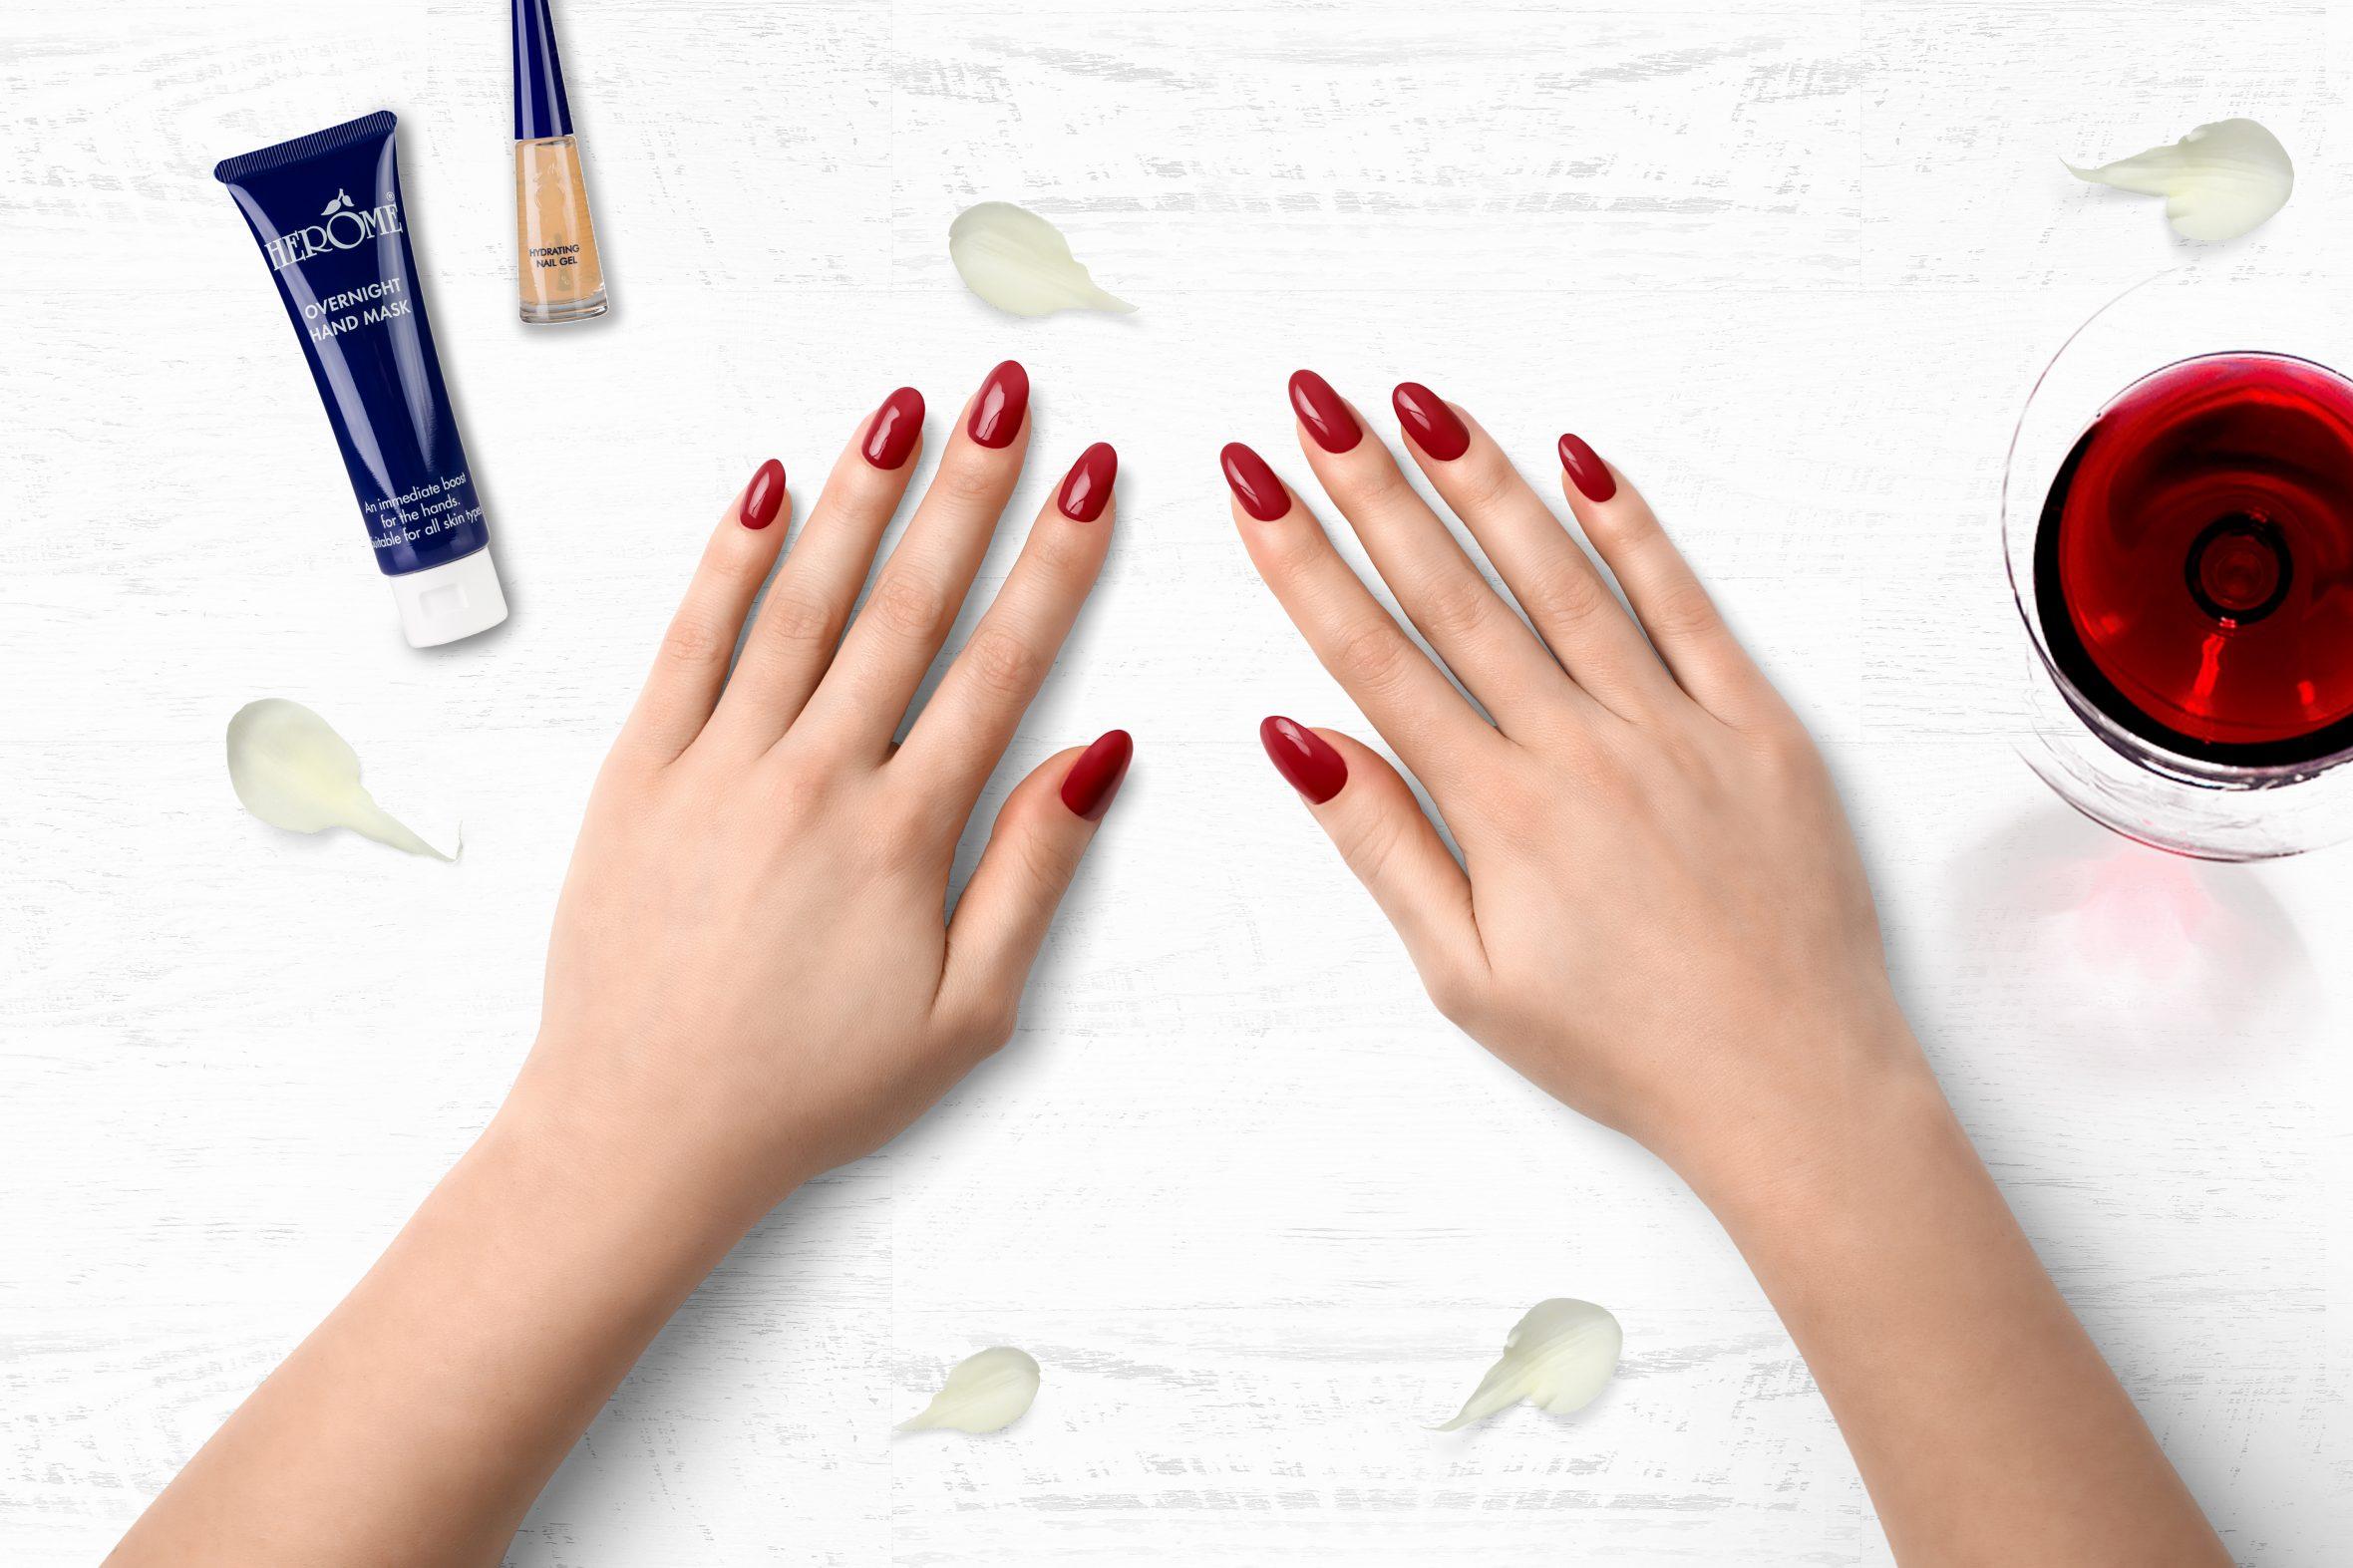 Roze nagellak nummer 105 van Herôme